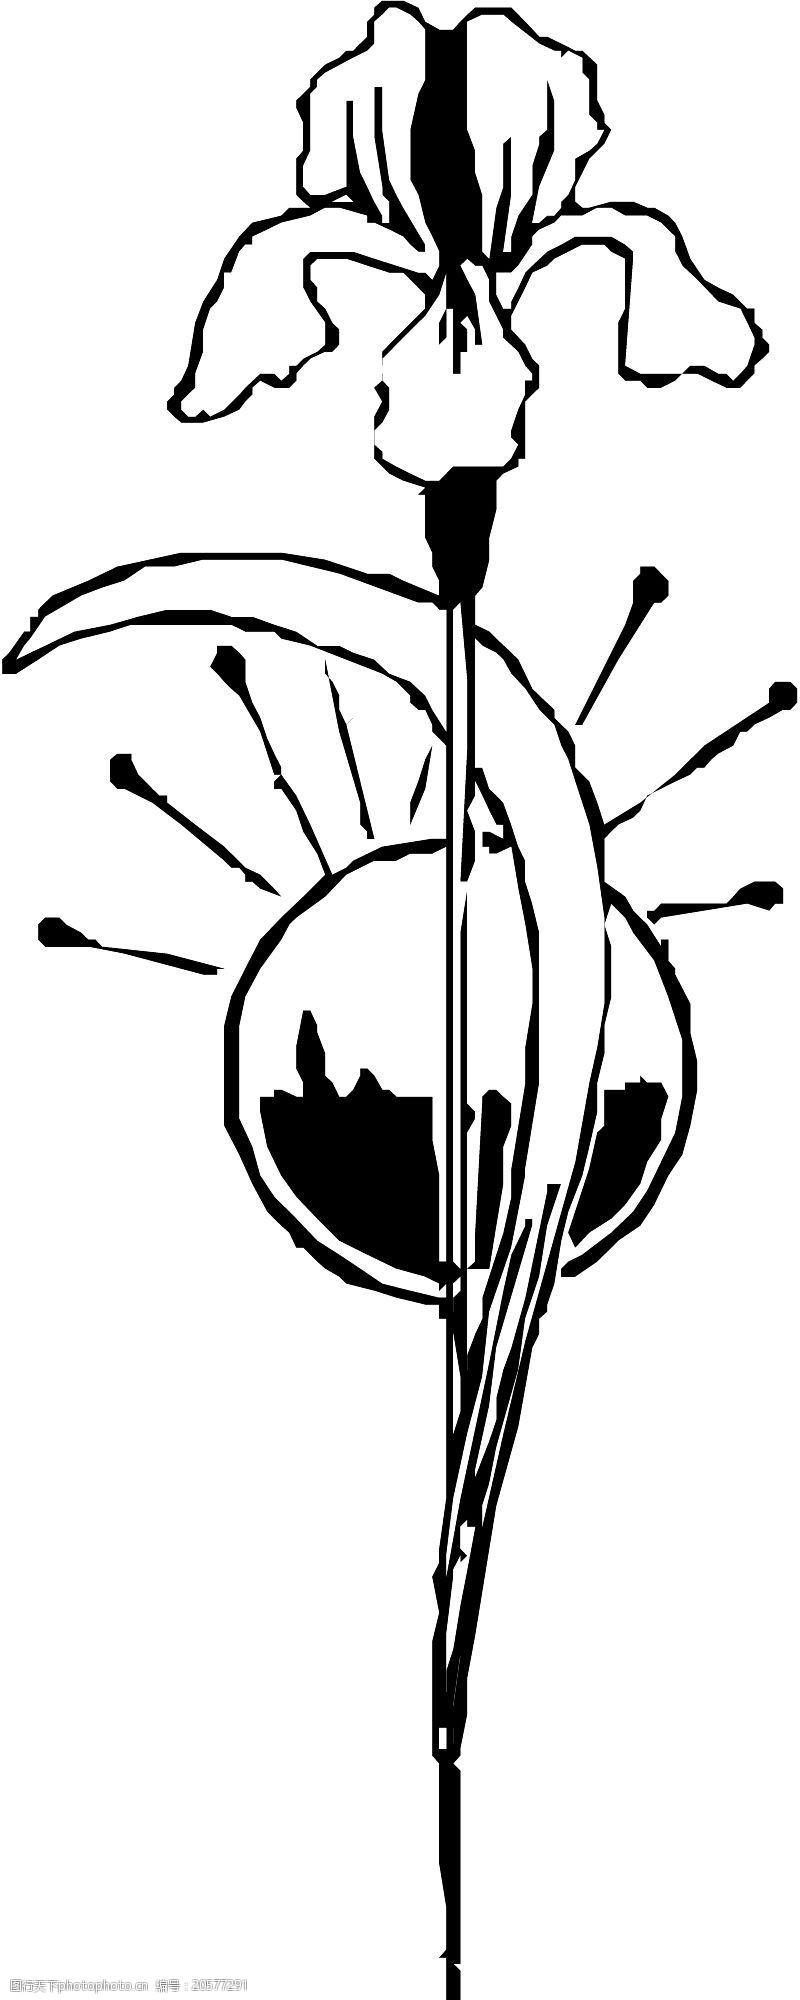 grasses花草1191